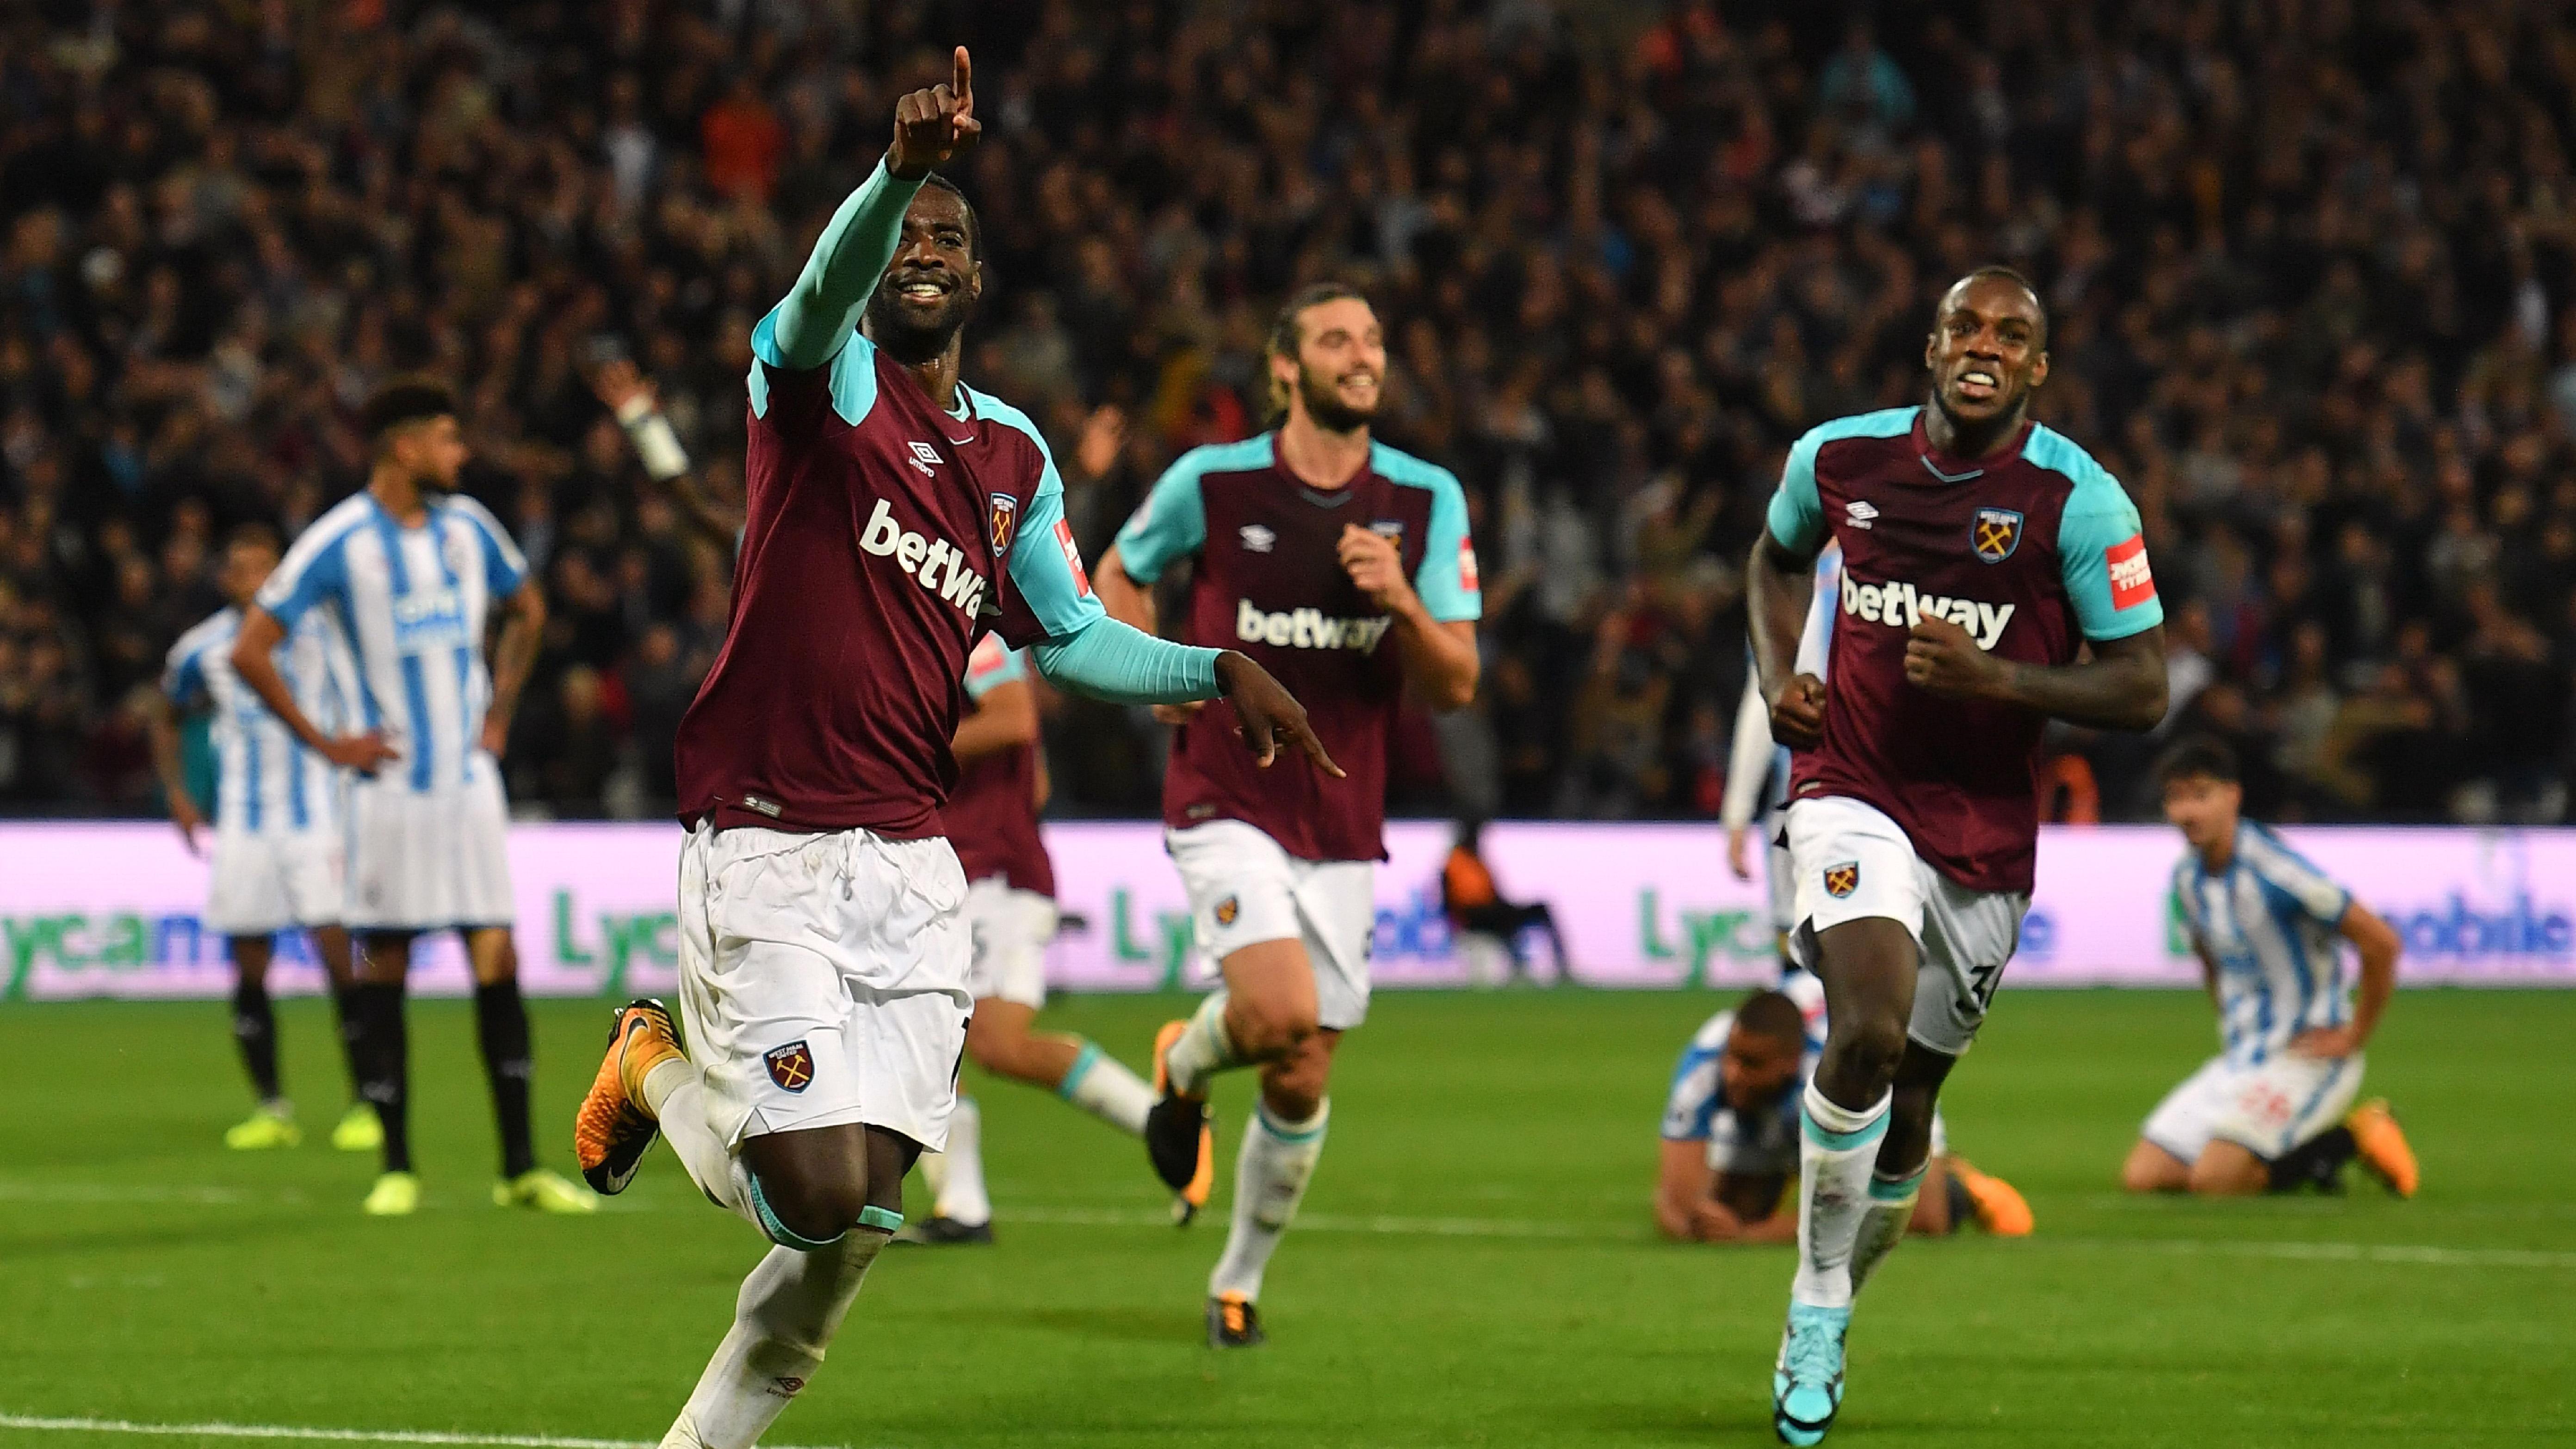 Pedro Obiang West Ham Huddersfield 120917